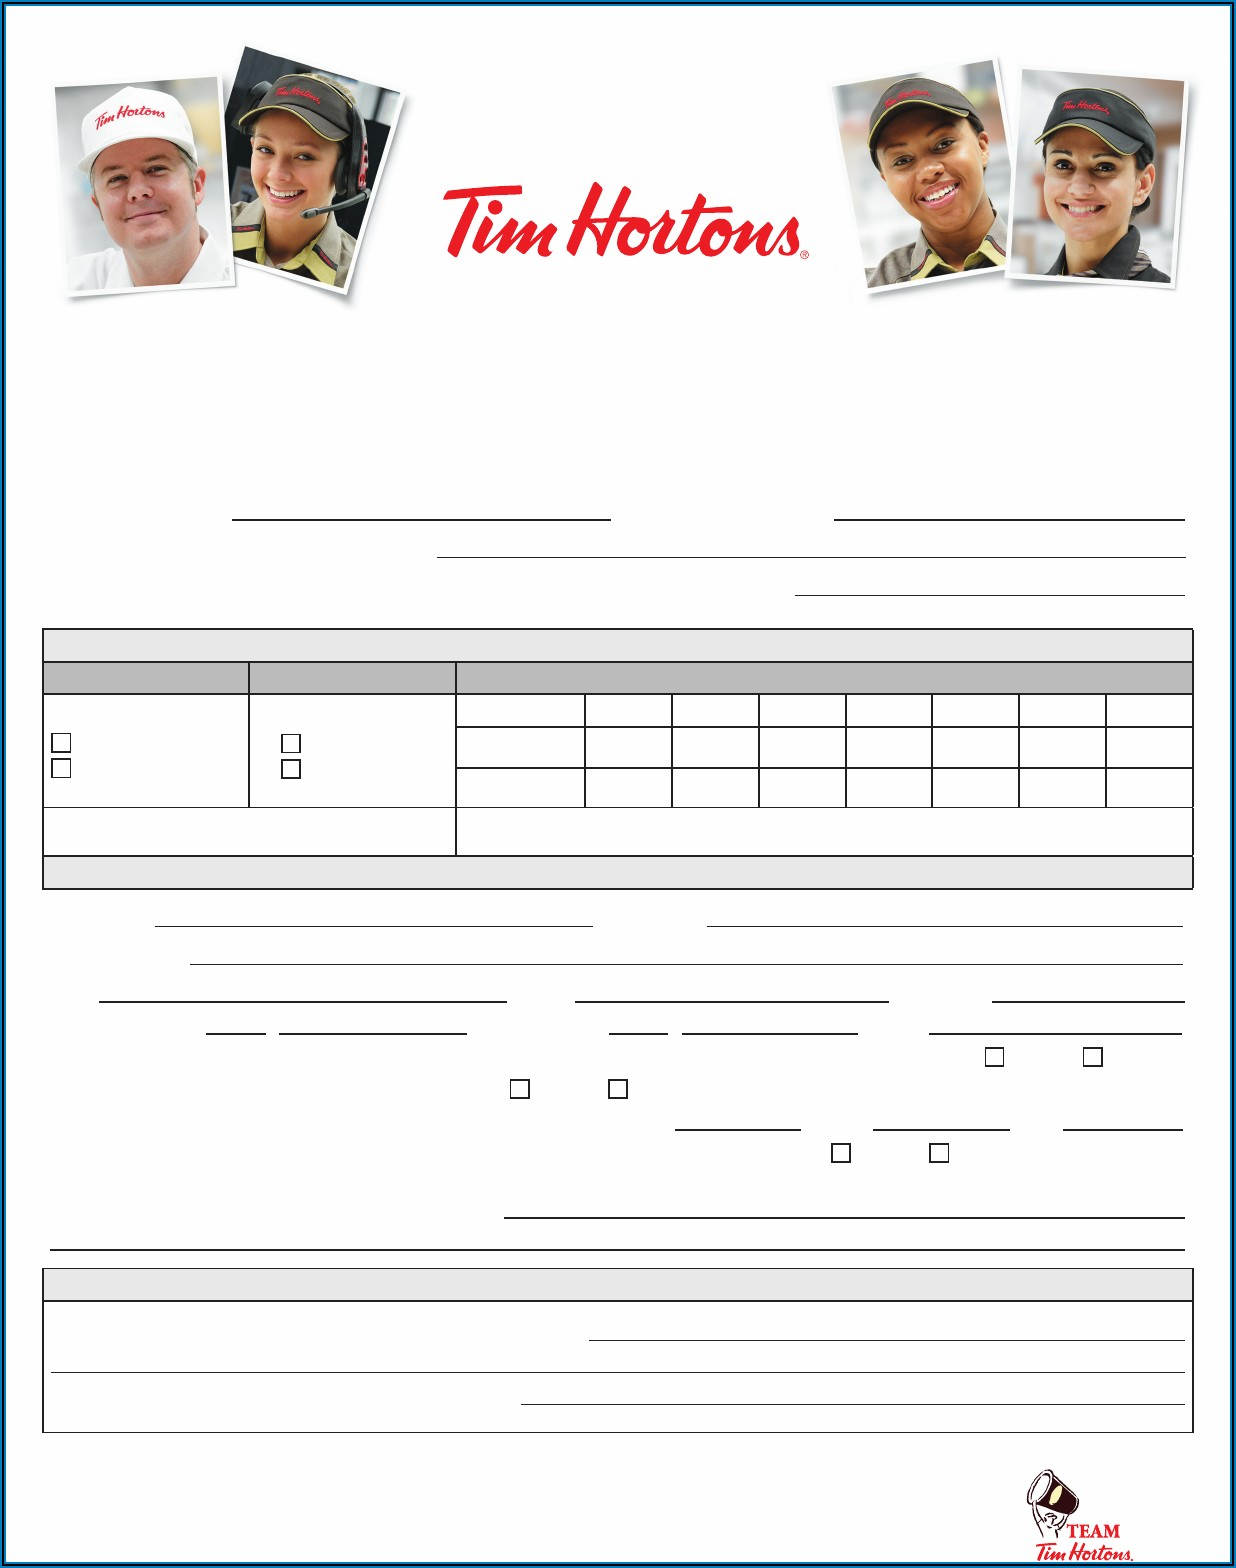 Tim Hortons Application Form 2020